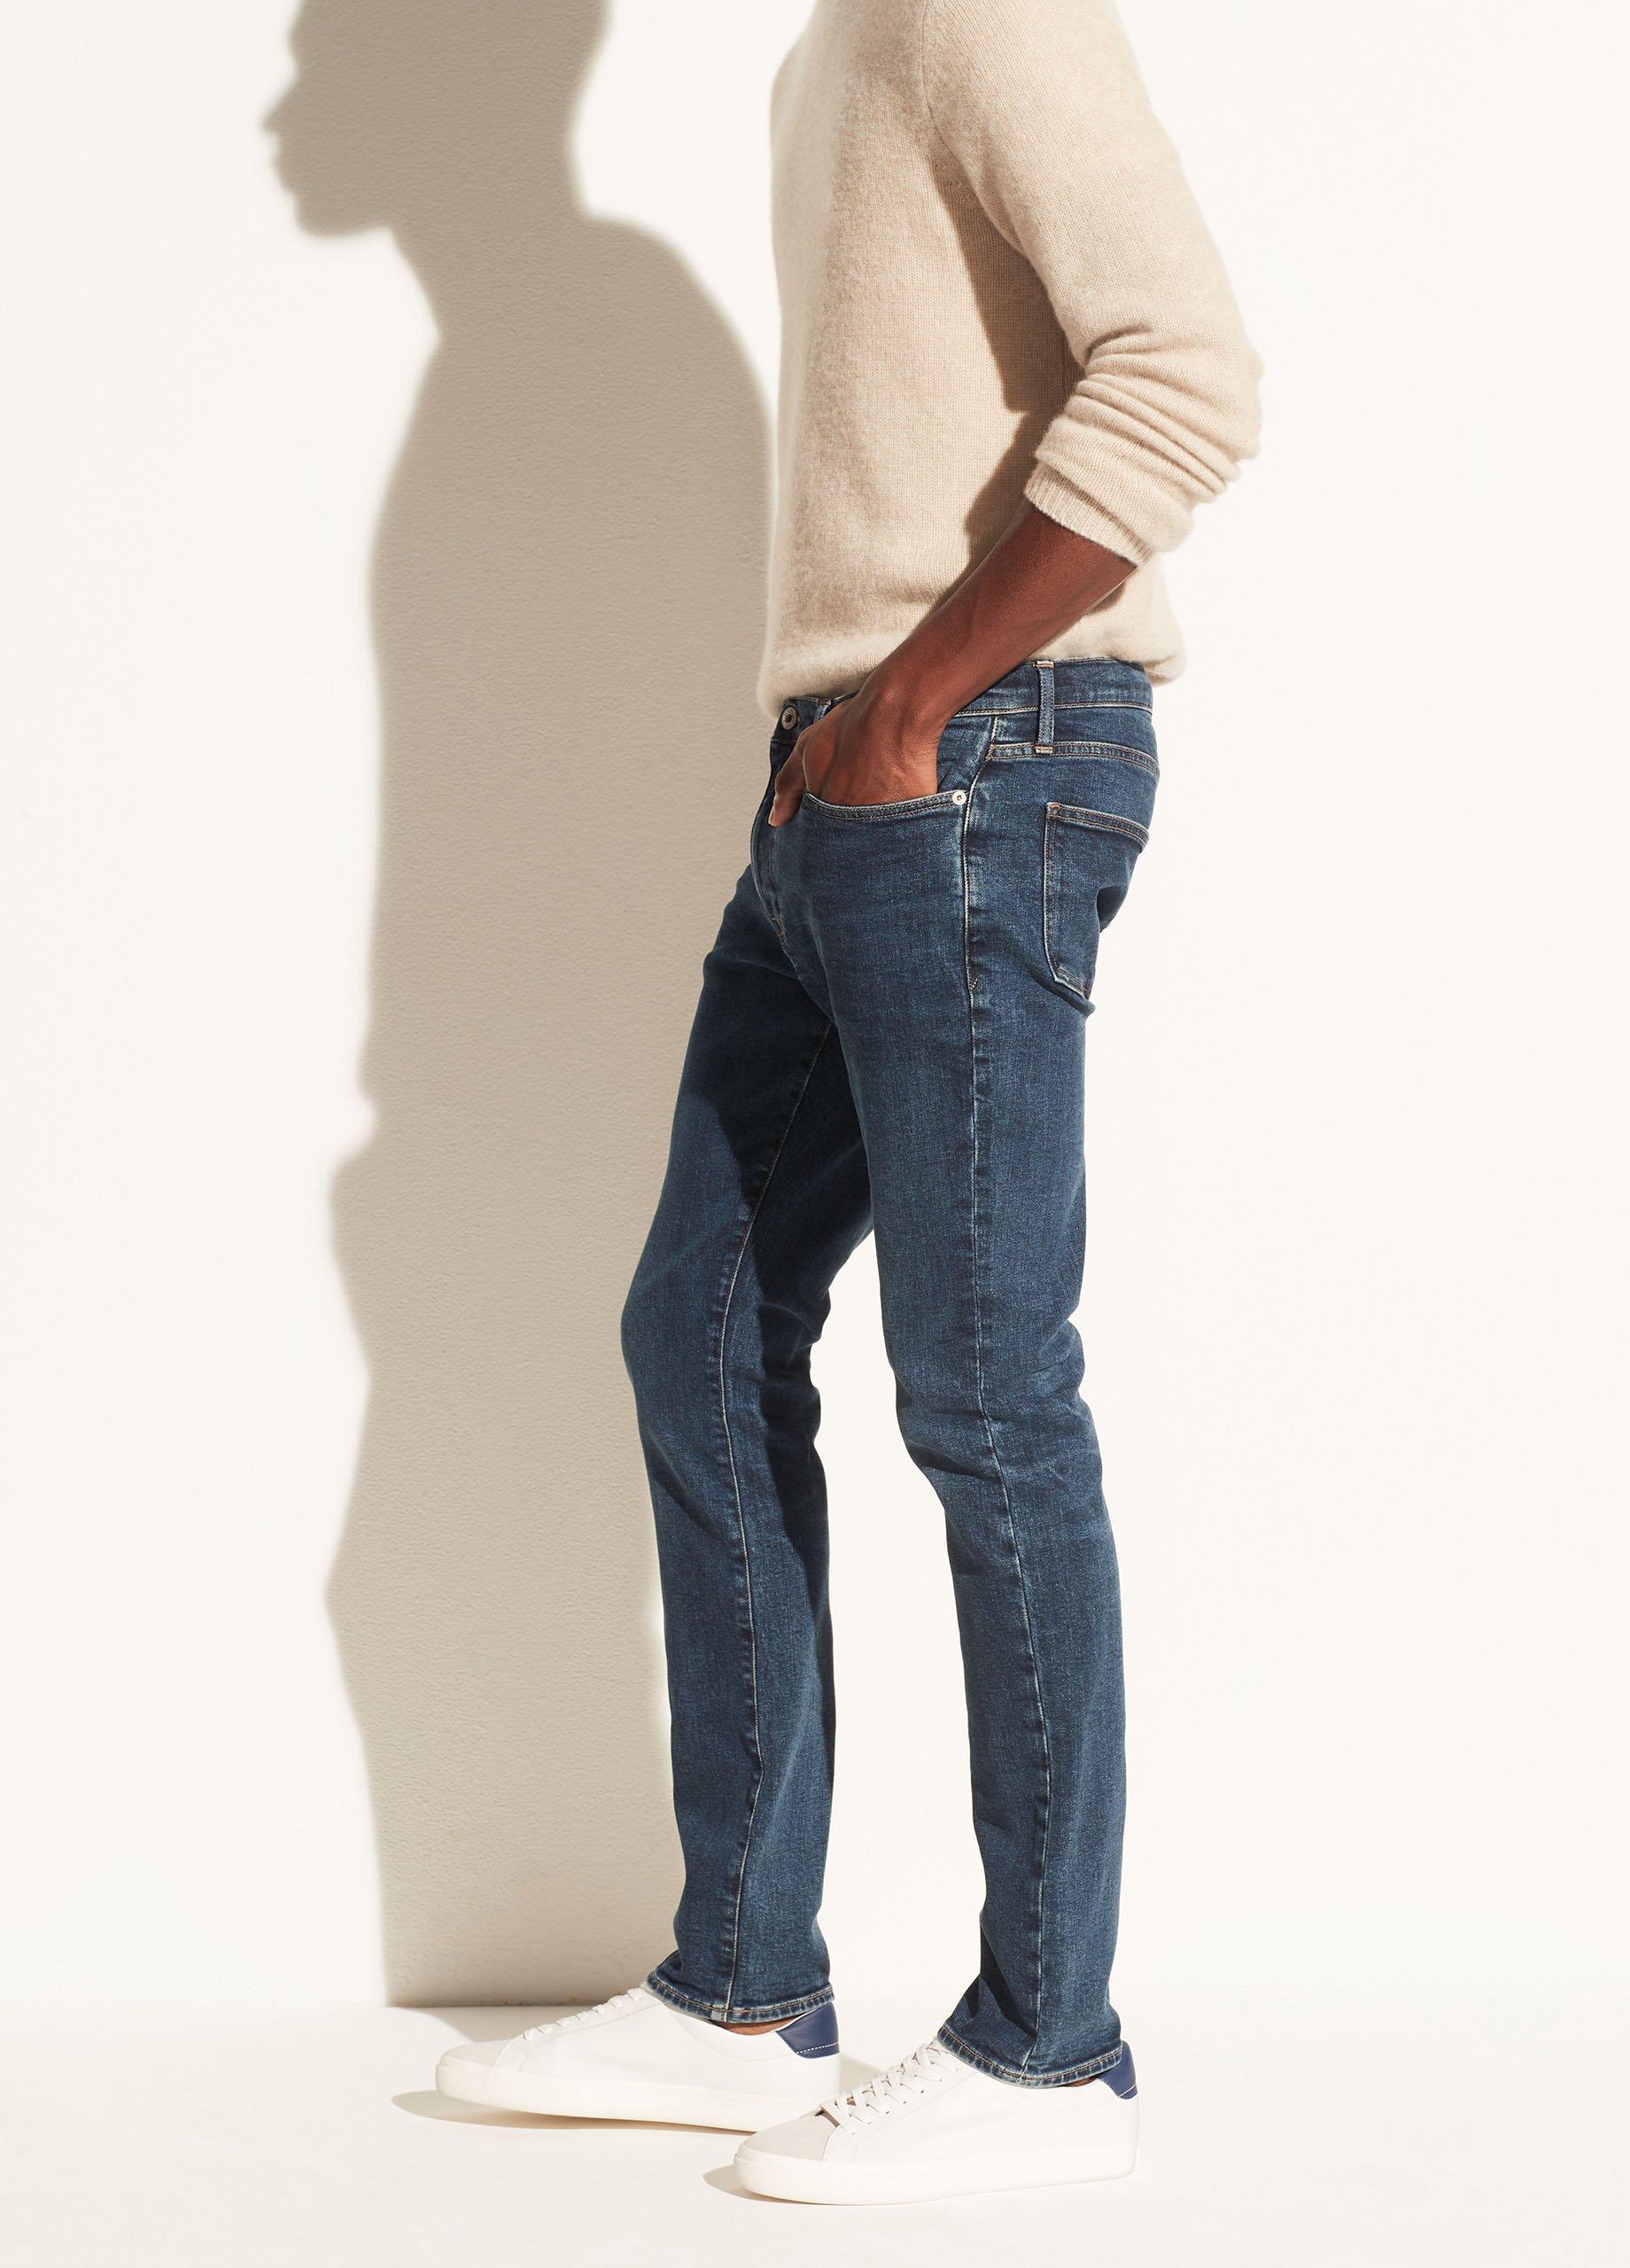 Exclusive DM 02 The Slim